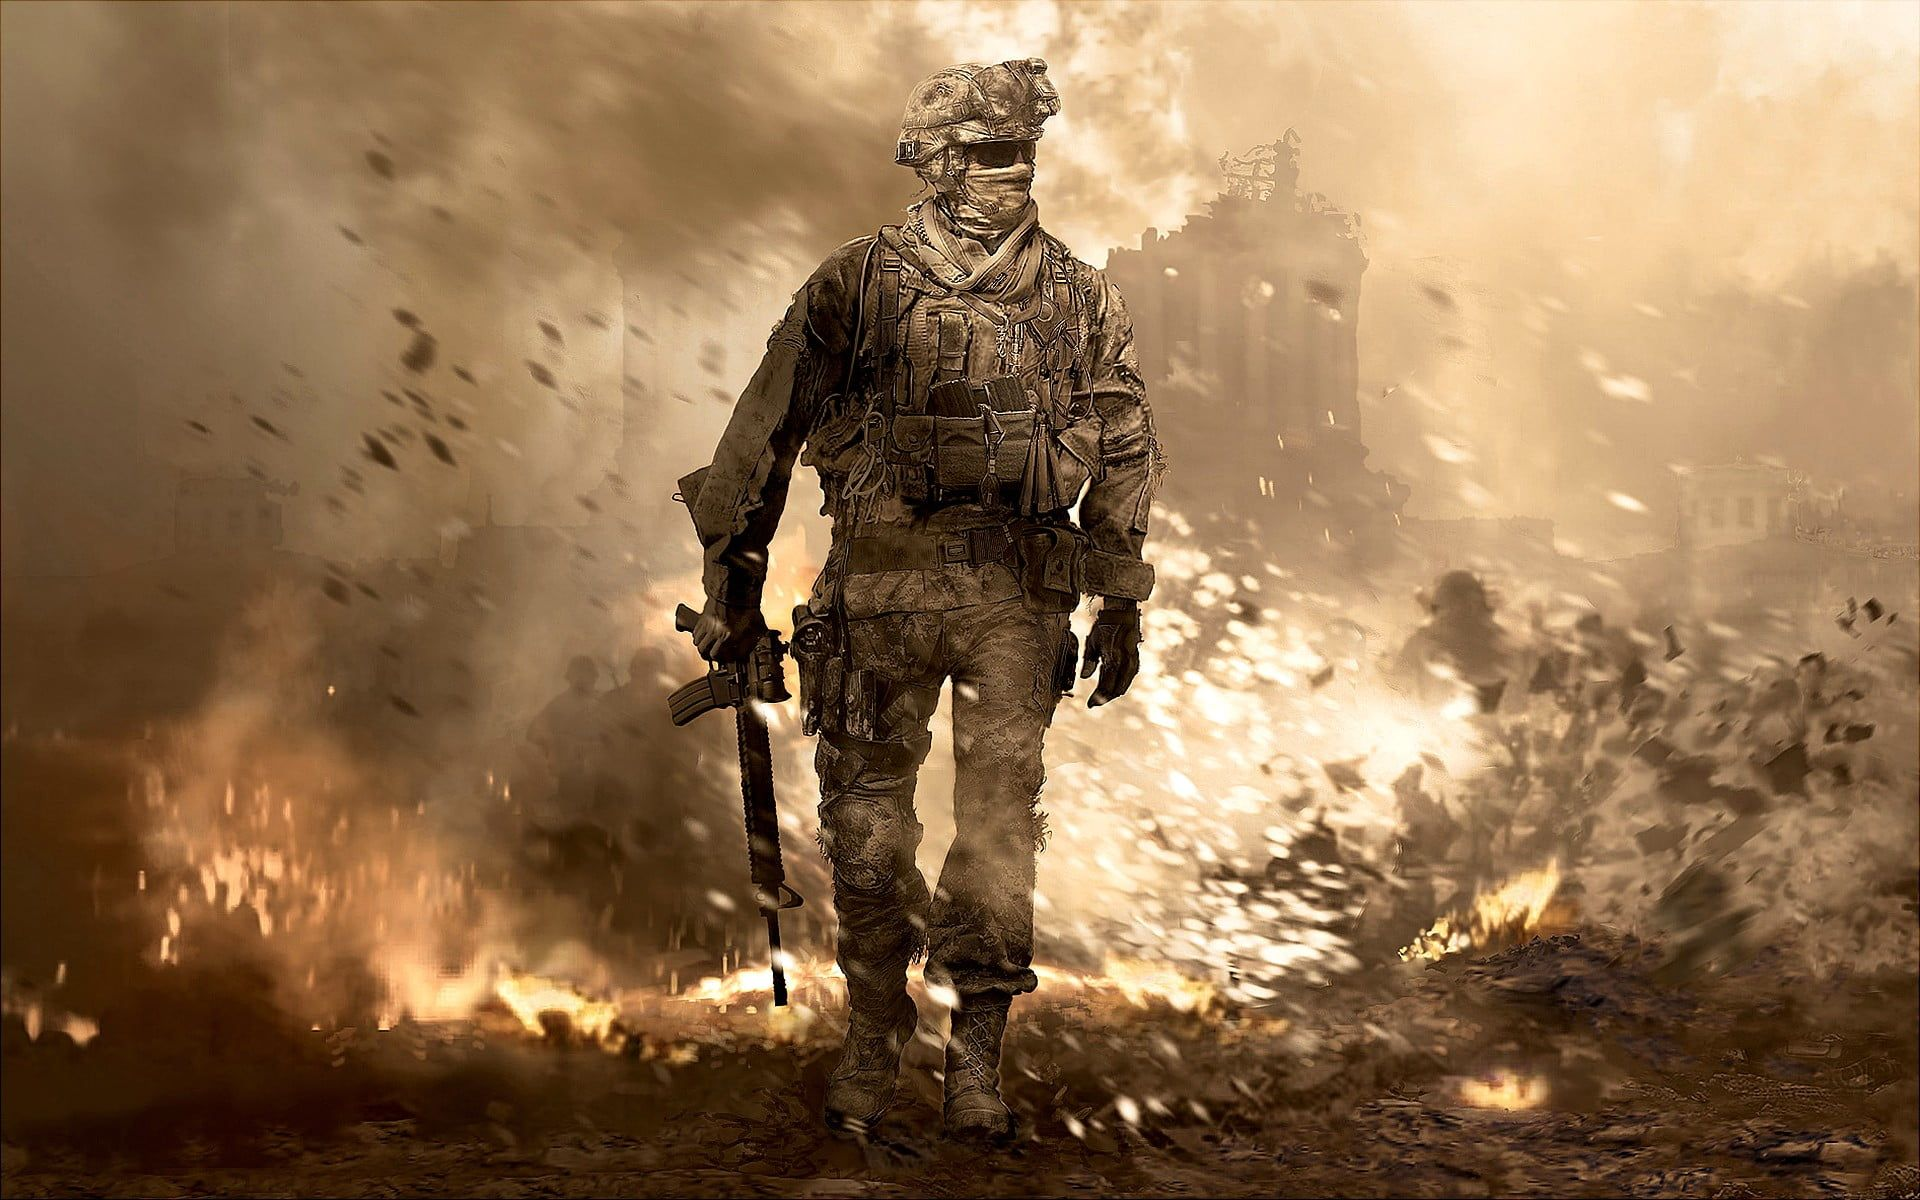 Soldier Wallpaper Call Of Duty Modern Warfare 2 Video Games Soldier War 1080p Wallpaper Hdwallpaper Desktop Modern Warfare Call Of Duty Gaming Wallpapers